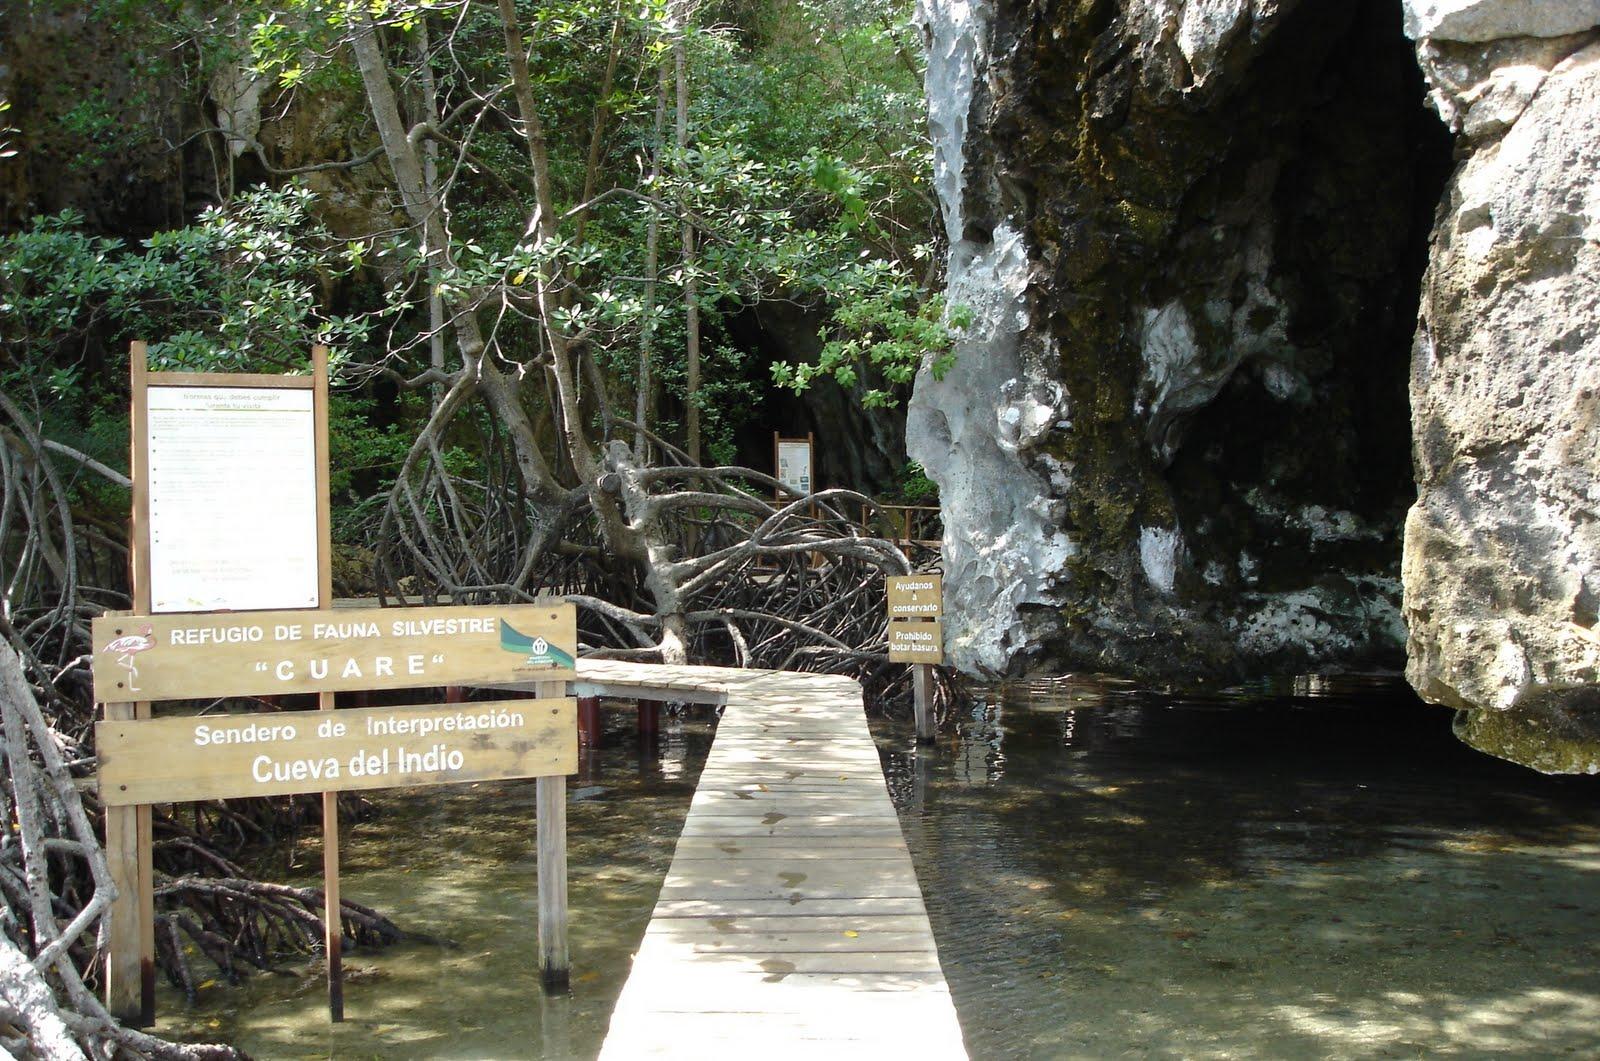 Refugio de Fauna Silvestre Cuare